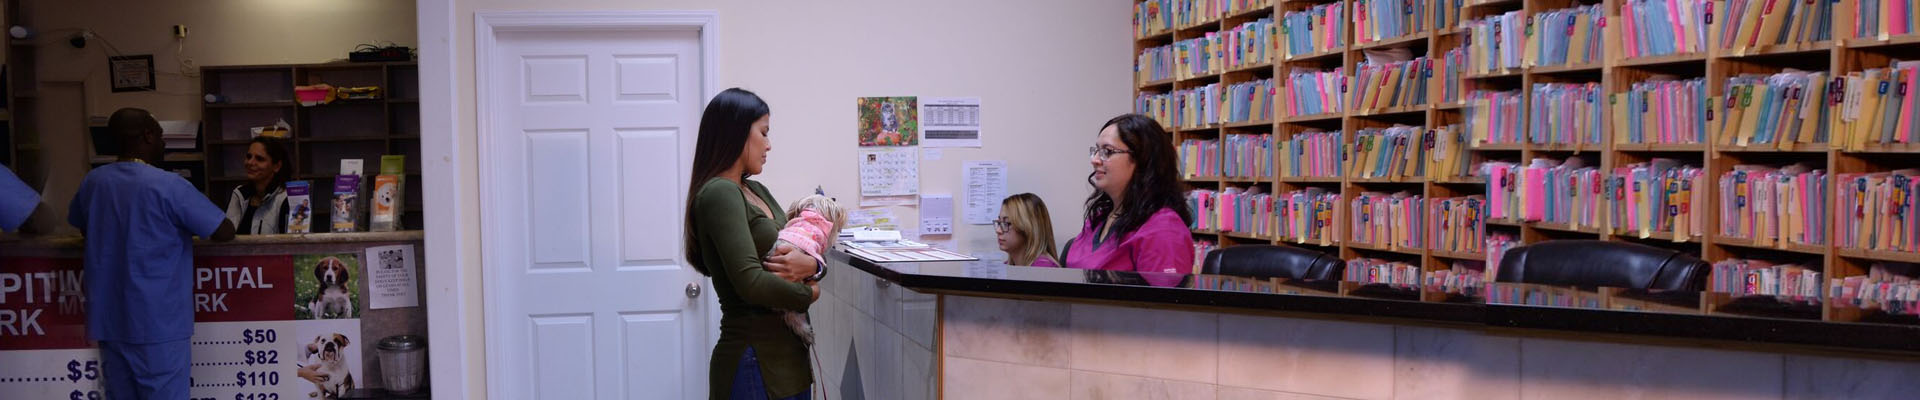 Veterinary Vaccination and Immunization at Animal Hospital